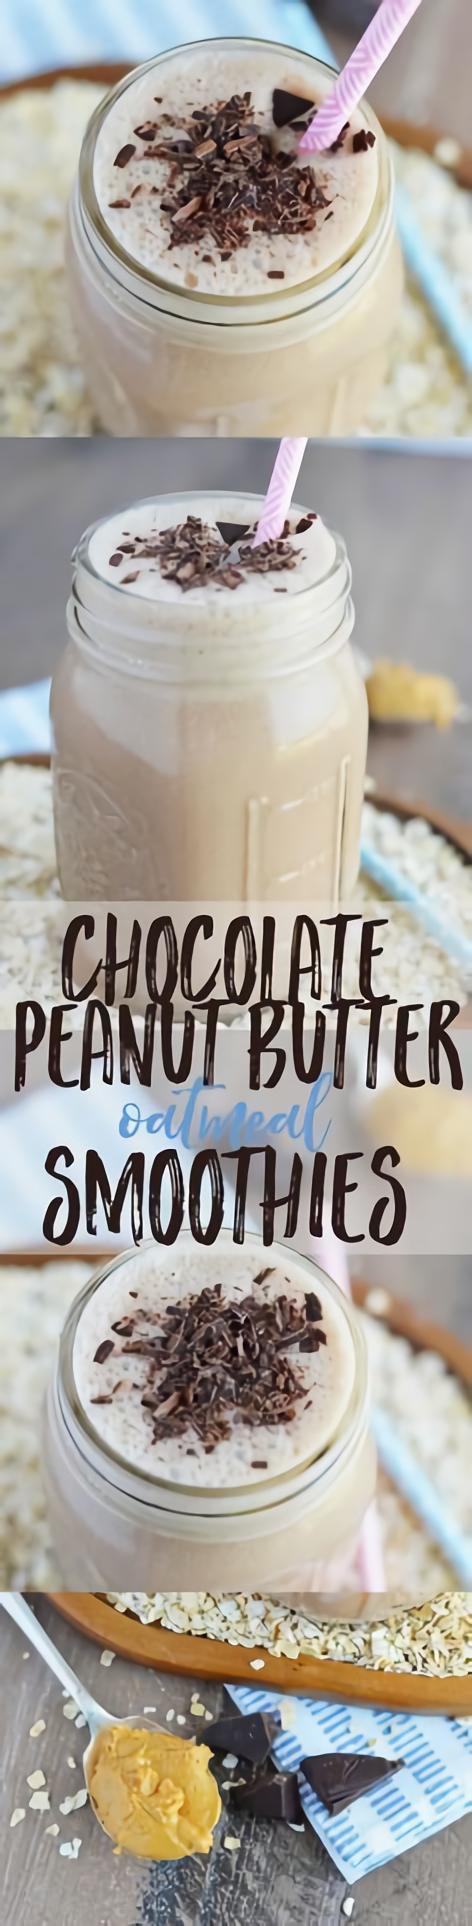 Chocolate #Peanut #Butter #Oatmeal #Smoothies #chocolatestrawberrysmoothie